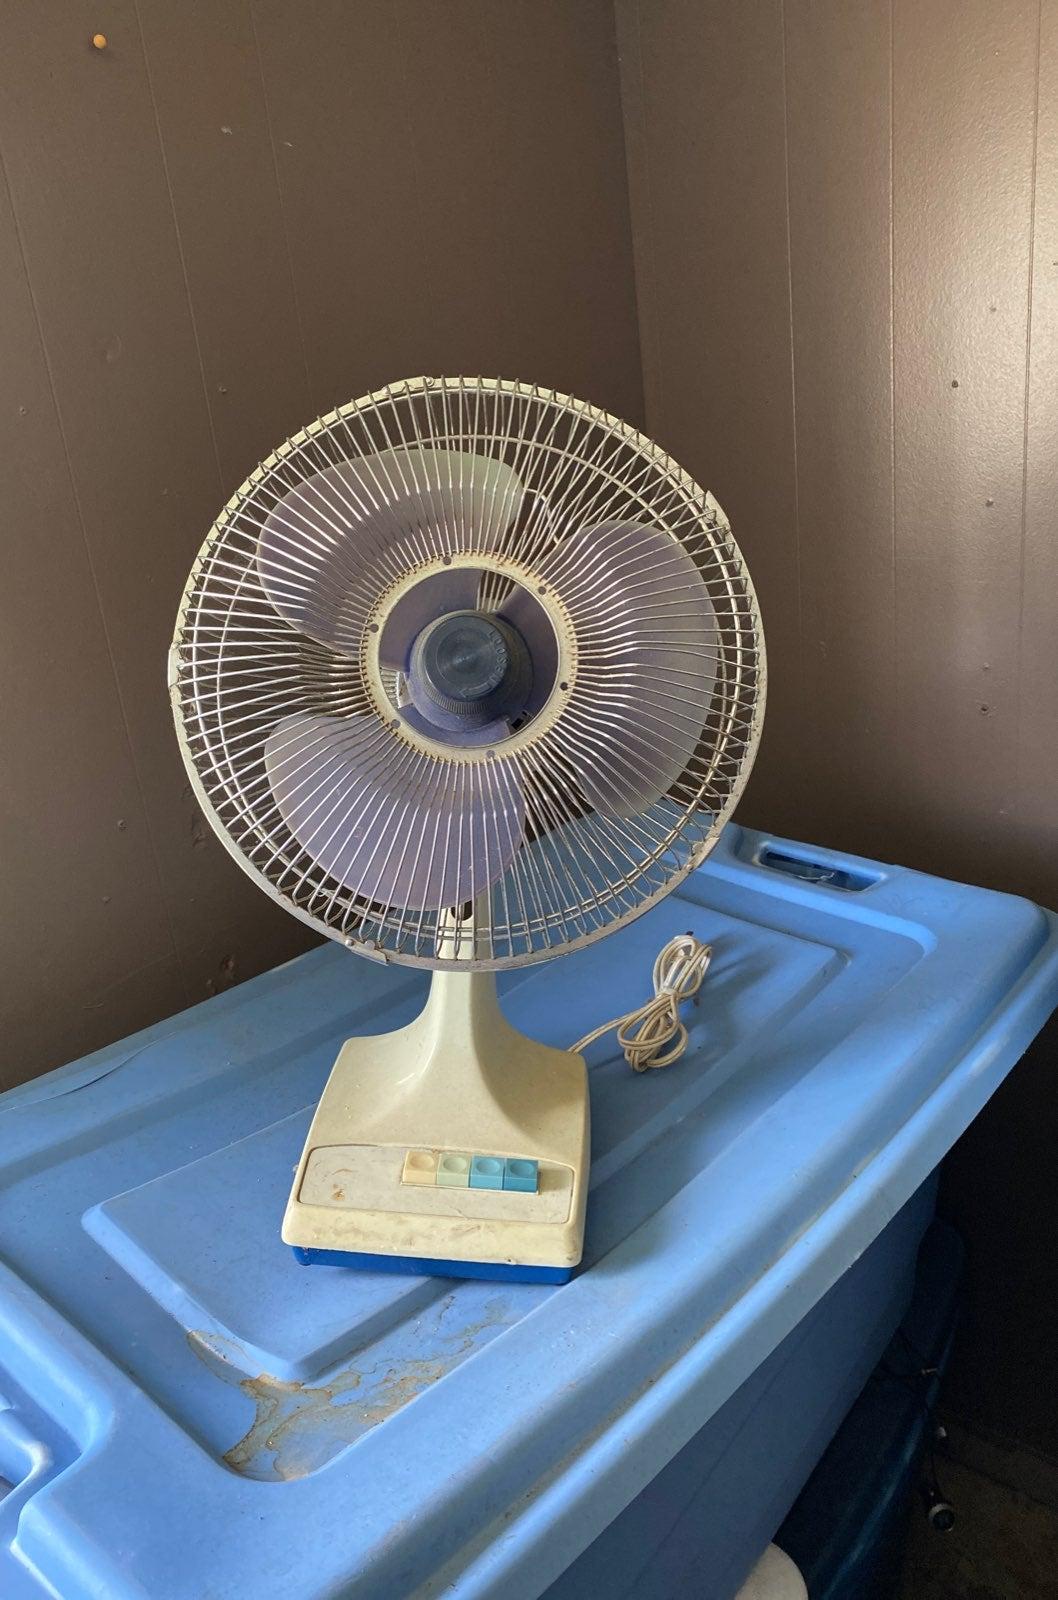 Vintage Oscillating Desk Tap fan 3 speed